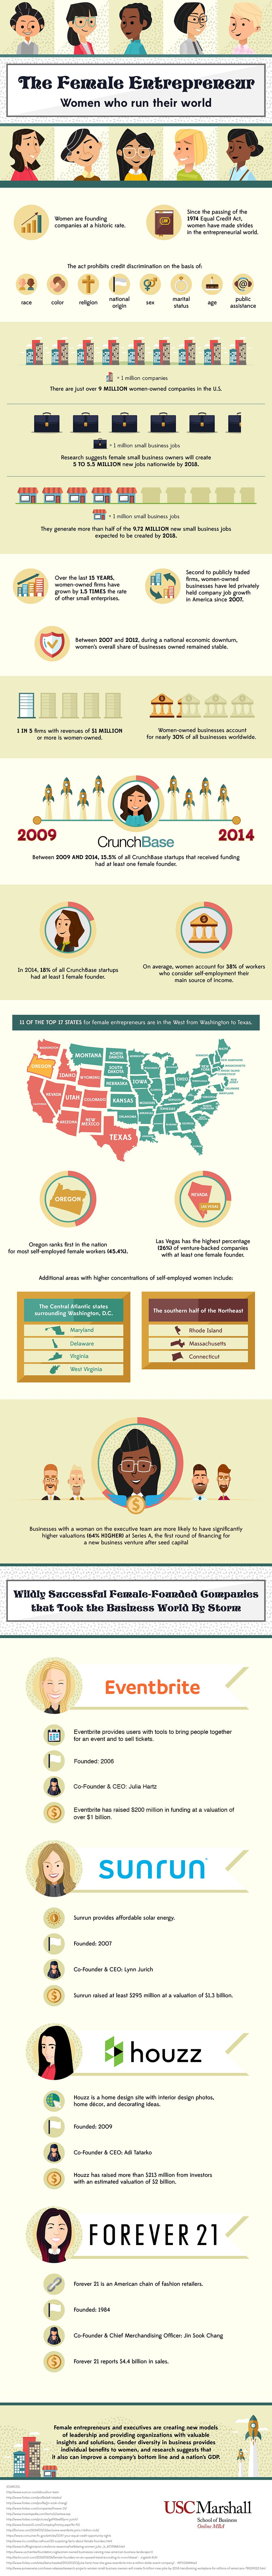 Female Entrepreneurship Is on the Rise (Infographic)